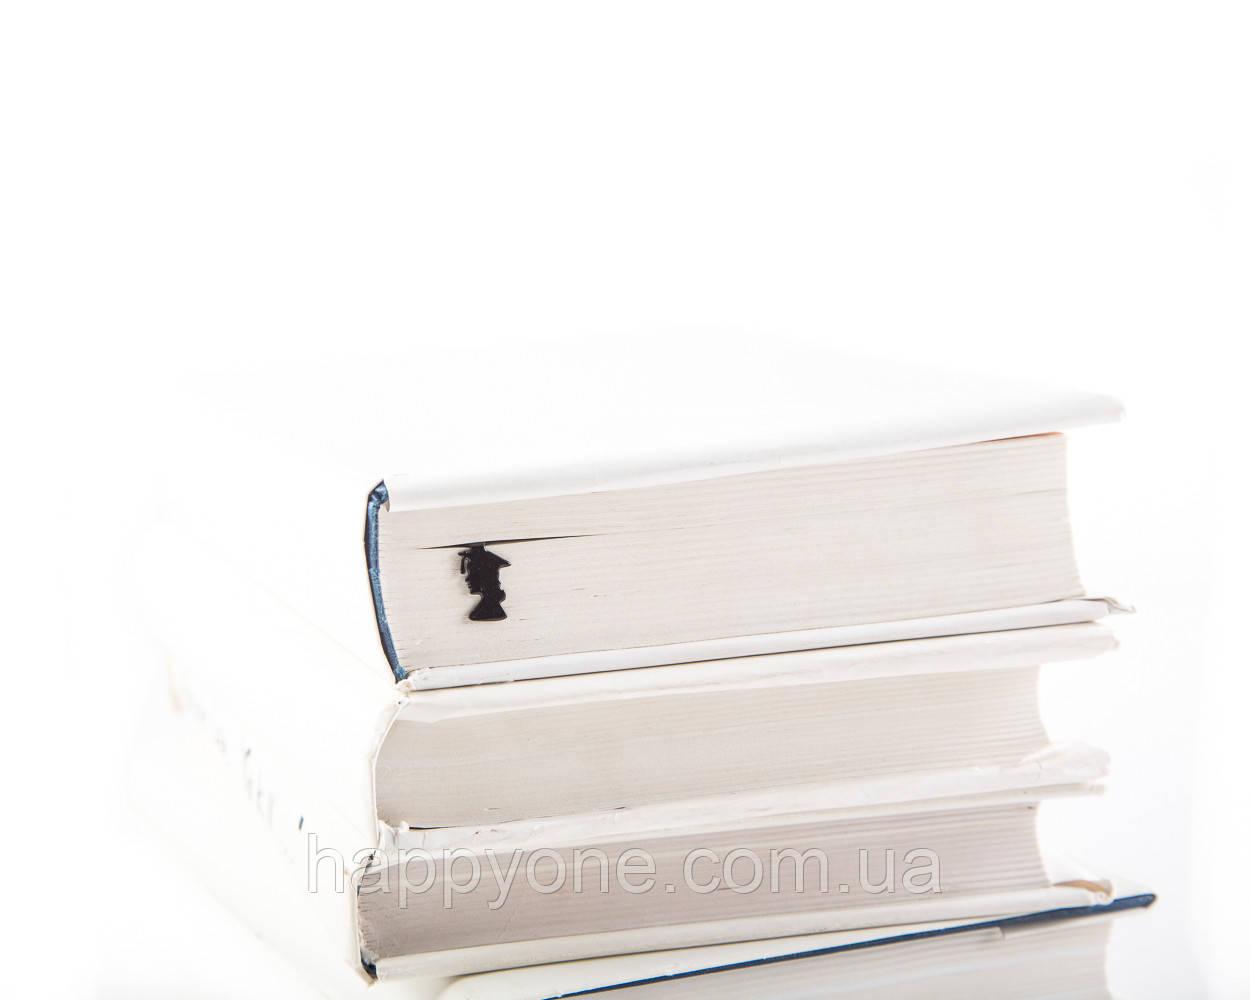 Закладка для книг Выпускница